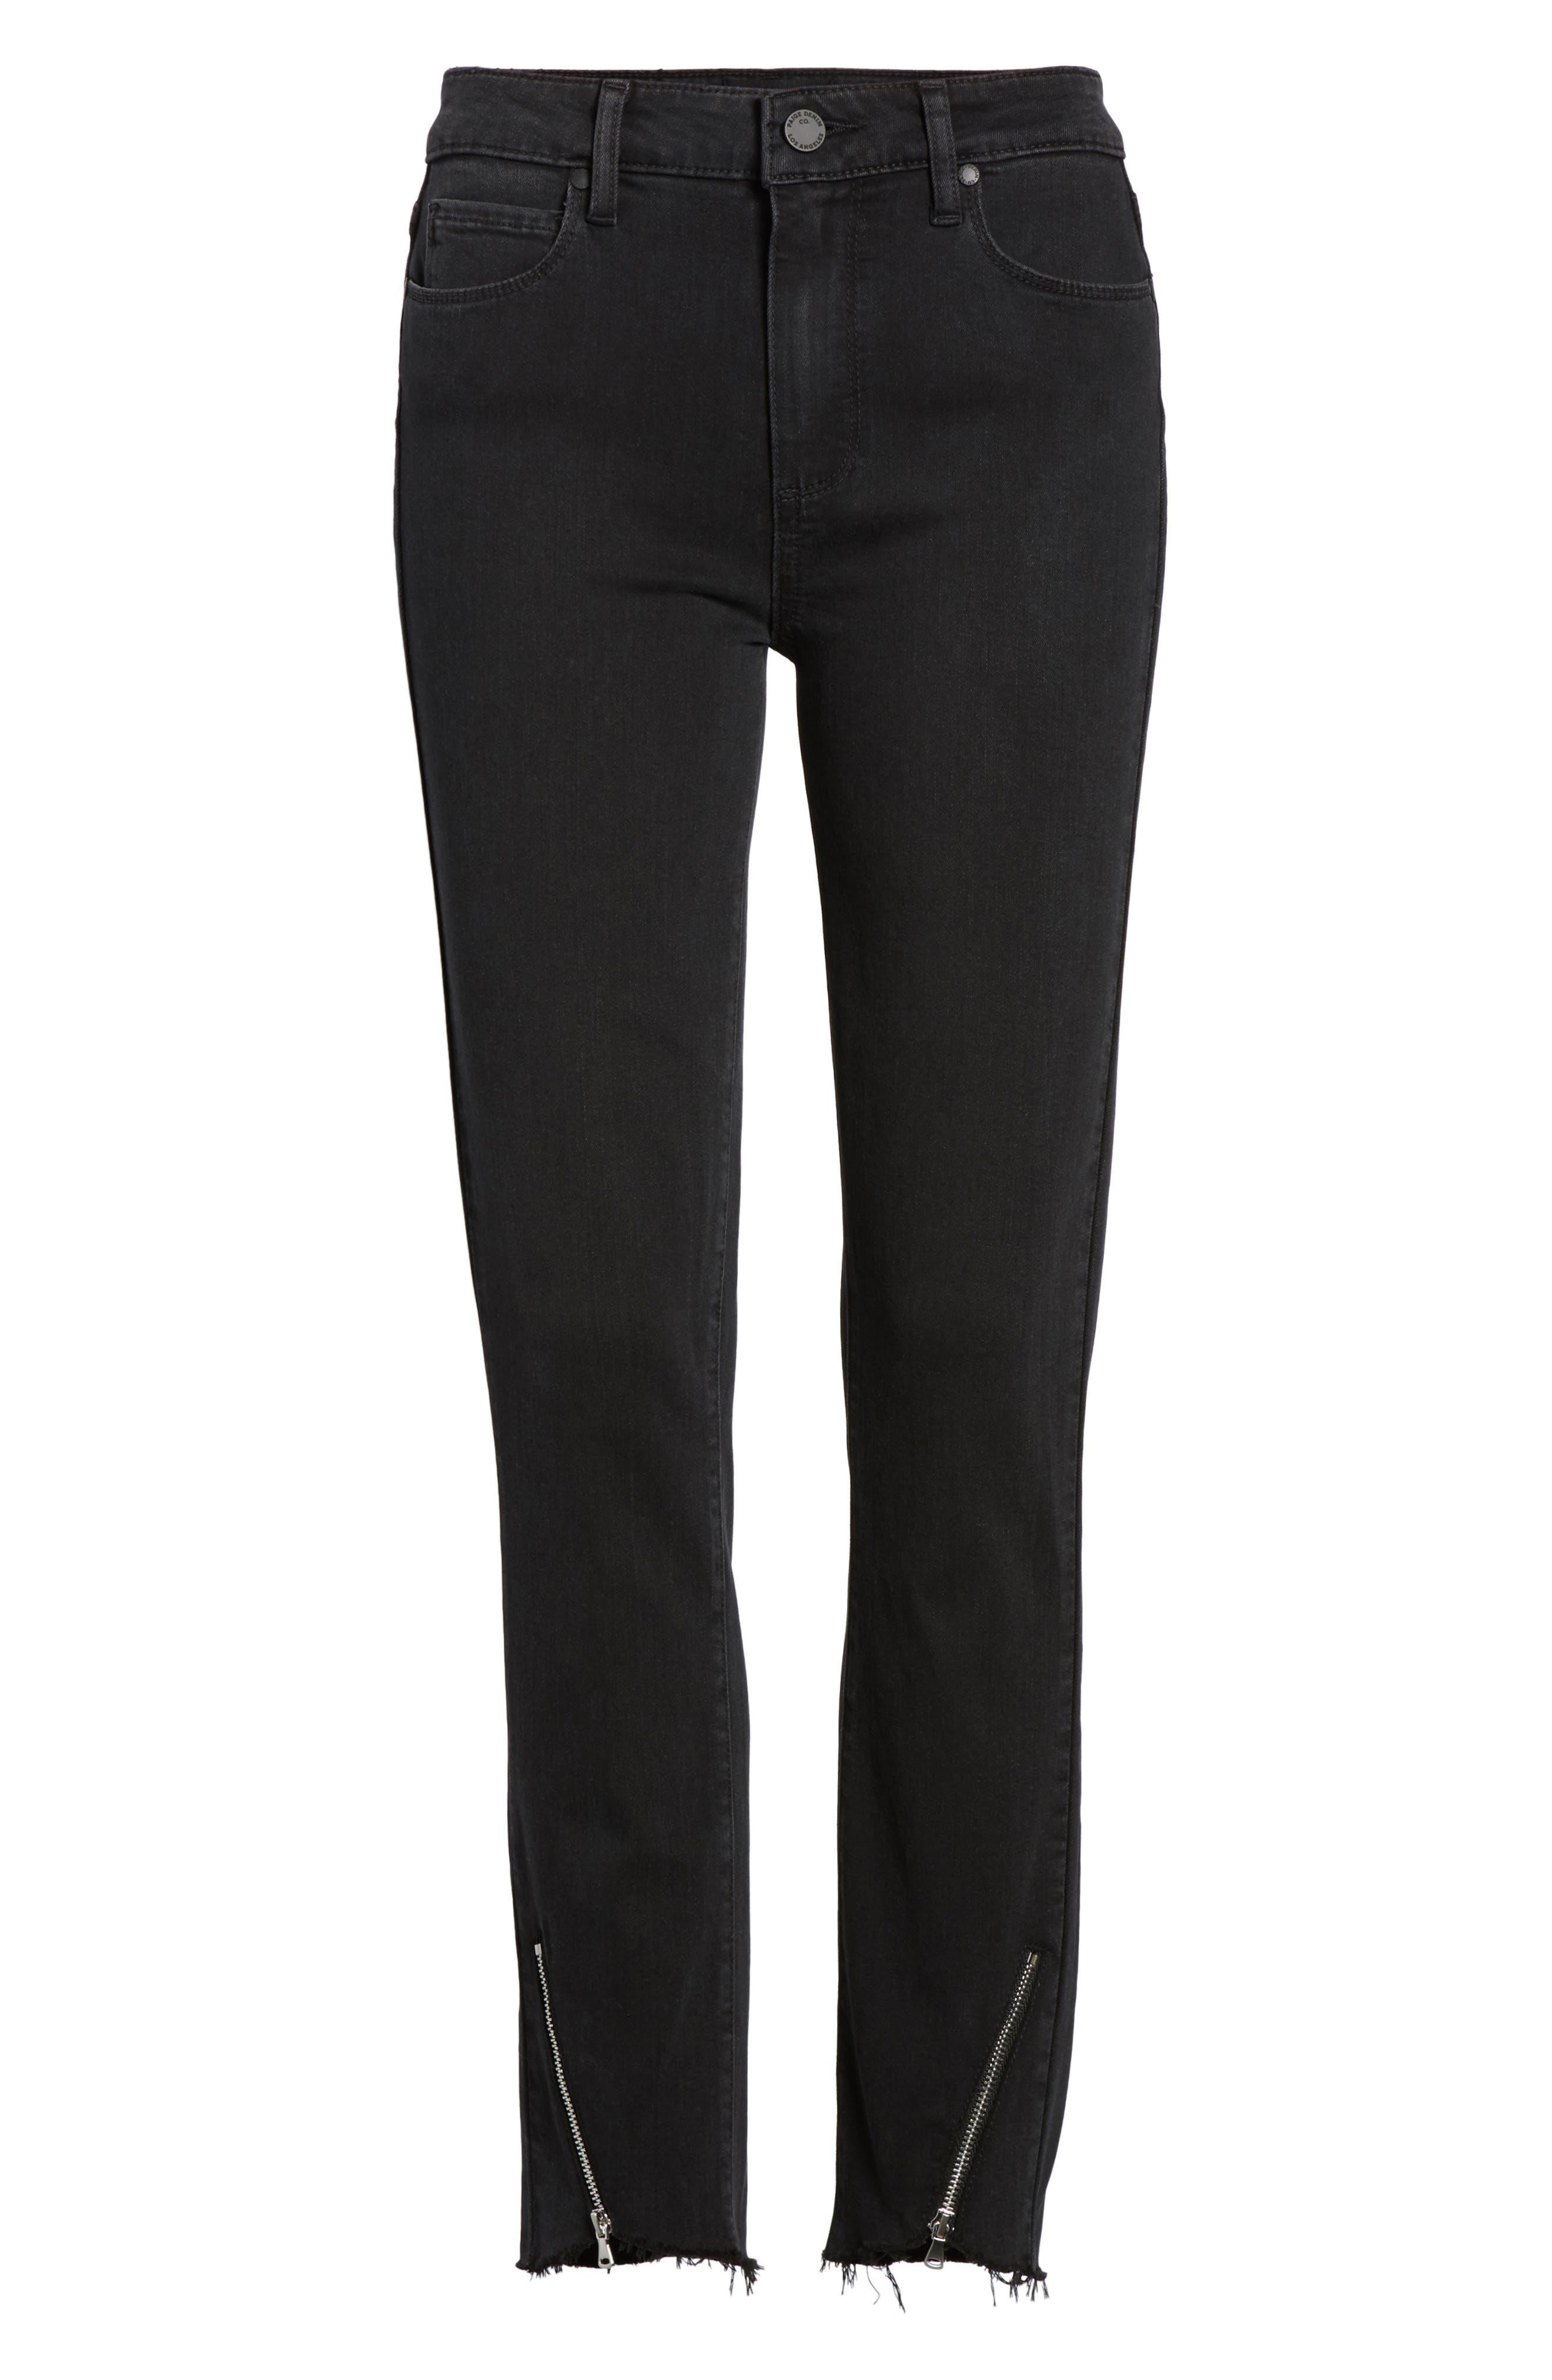 Transcend - Hoxton High Waist Ultra Skinny Jeans,                             Alternate thumbnail 7, color,                             Black Fog